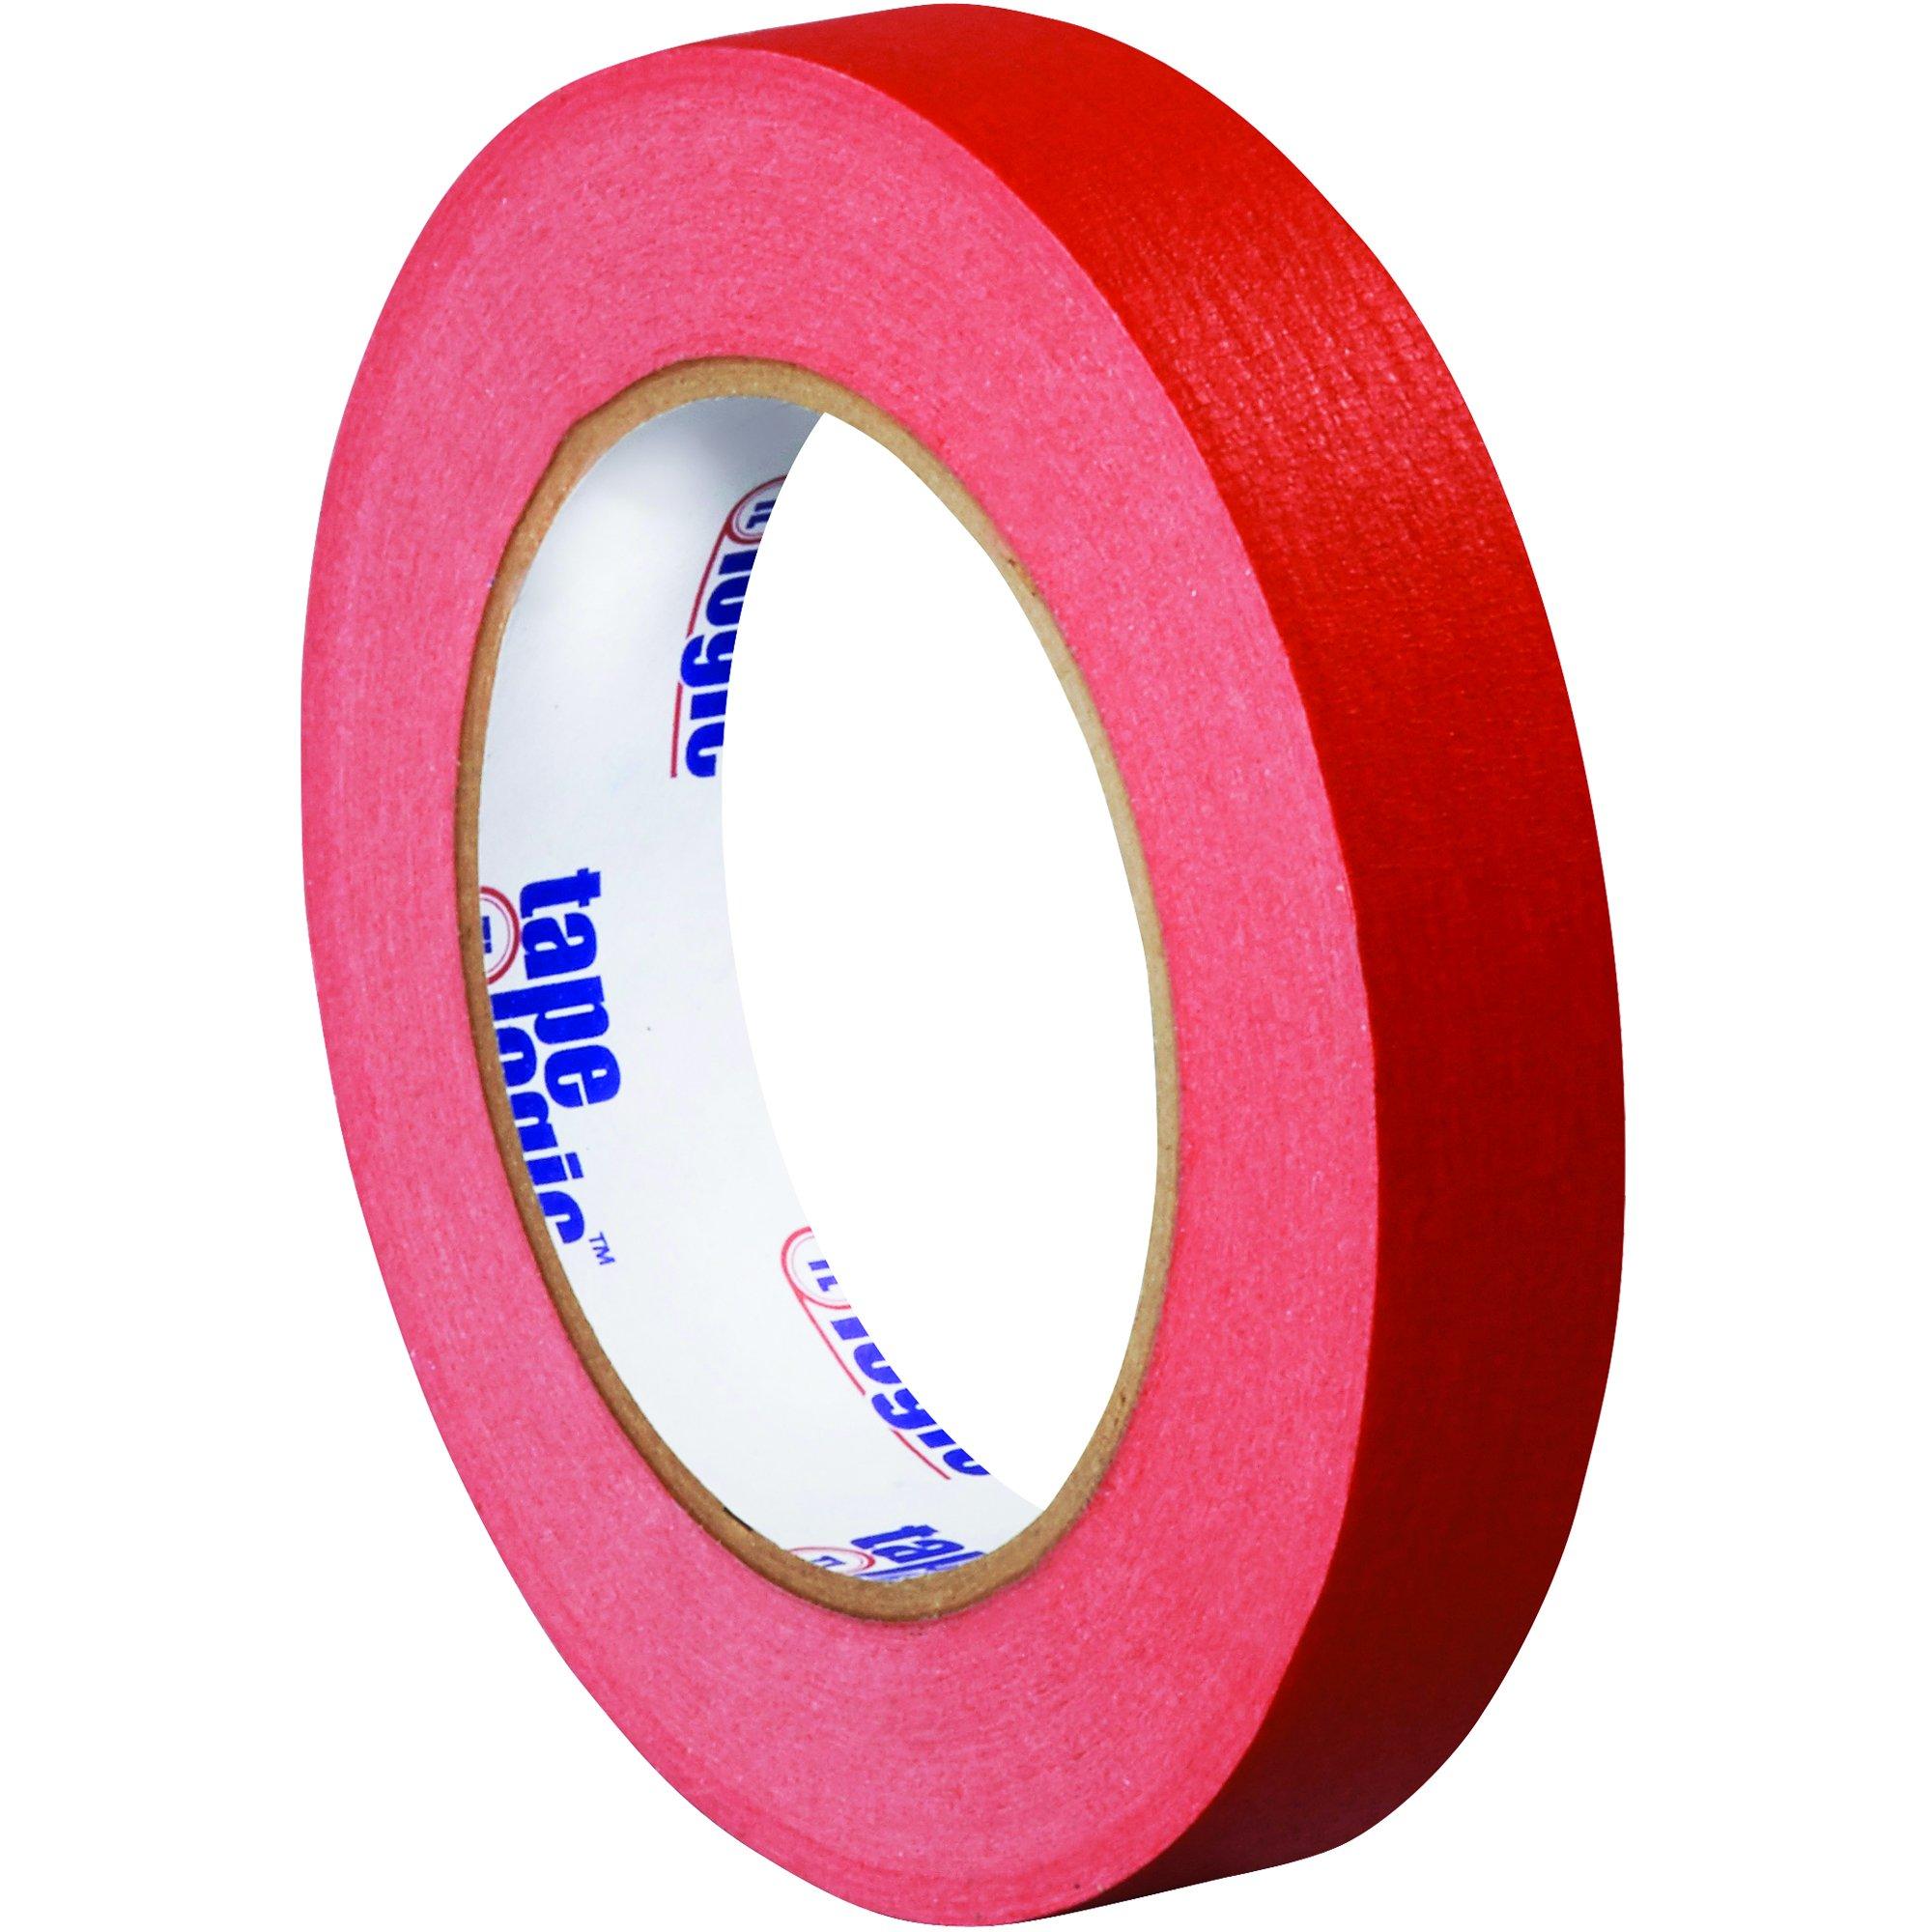 BOX USA BT93400312PKR Tape Logic Masking Tape, 3/4'' x 60 yd., Red (Pack of 12)